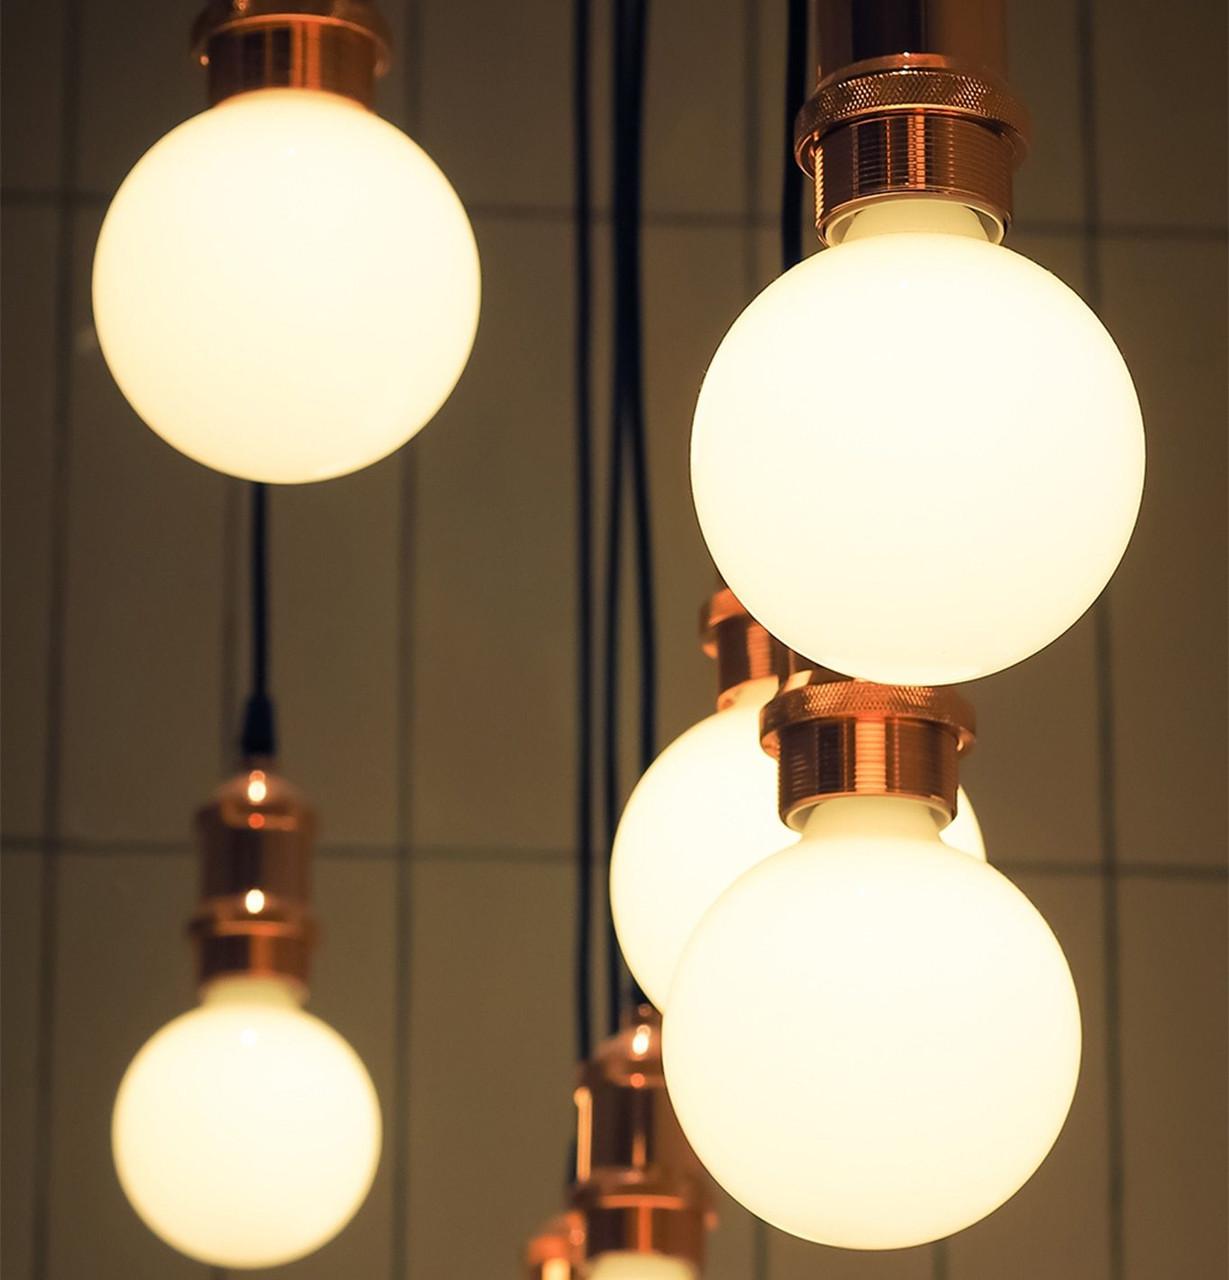 LED G80 BC-B22d Light Bulbs